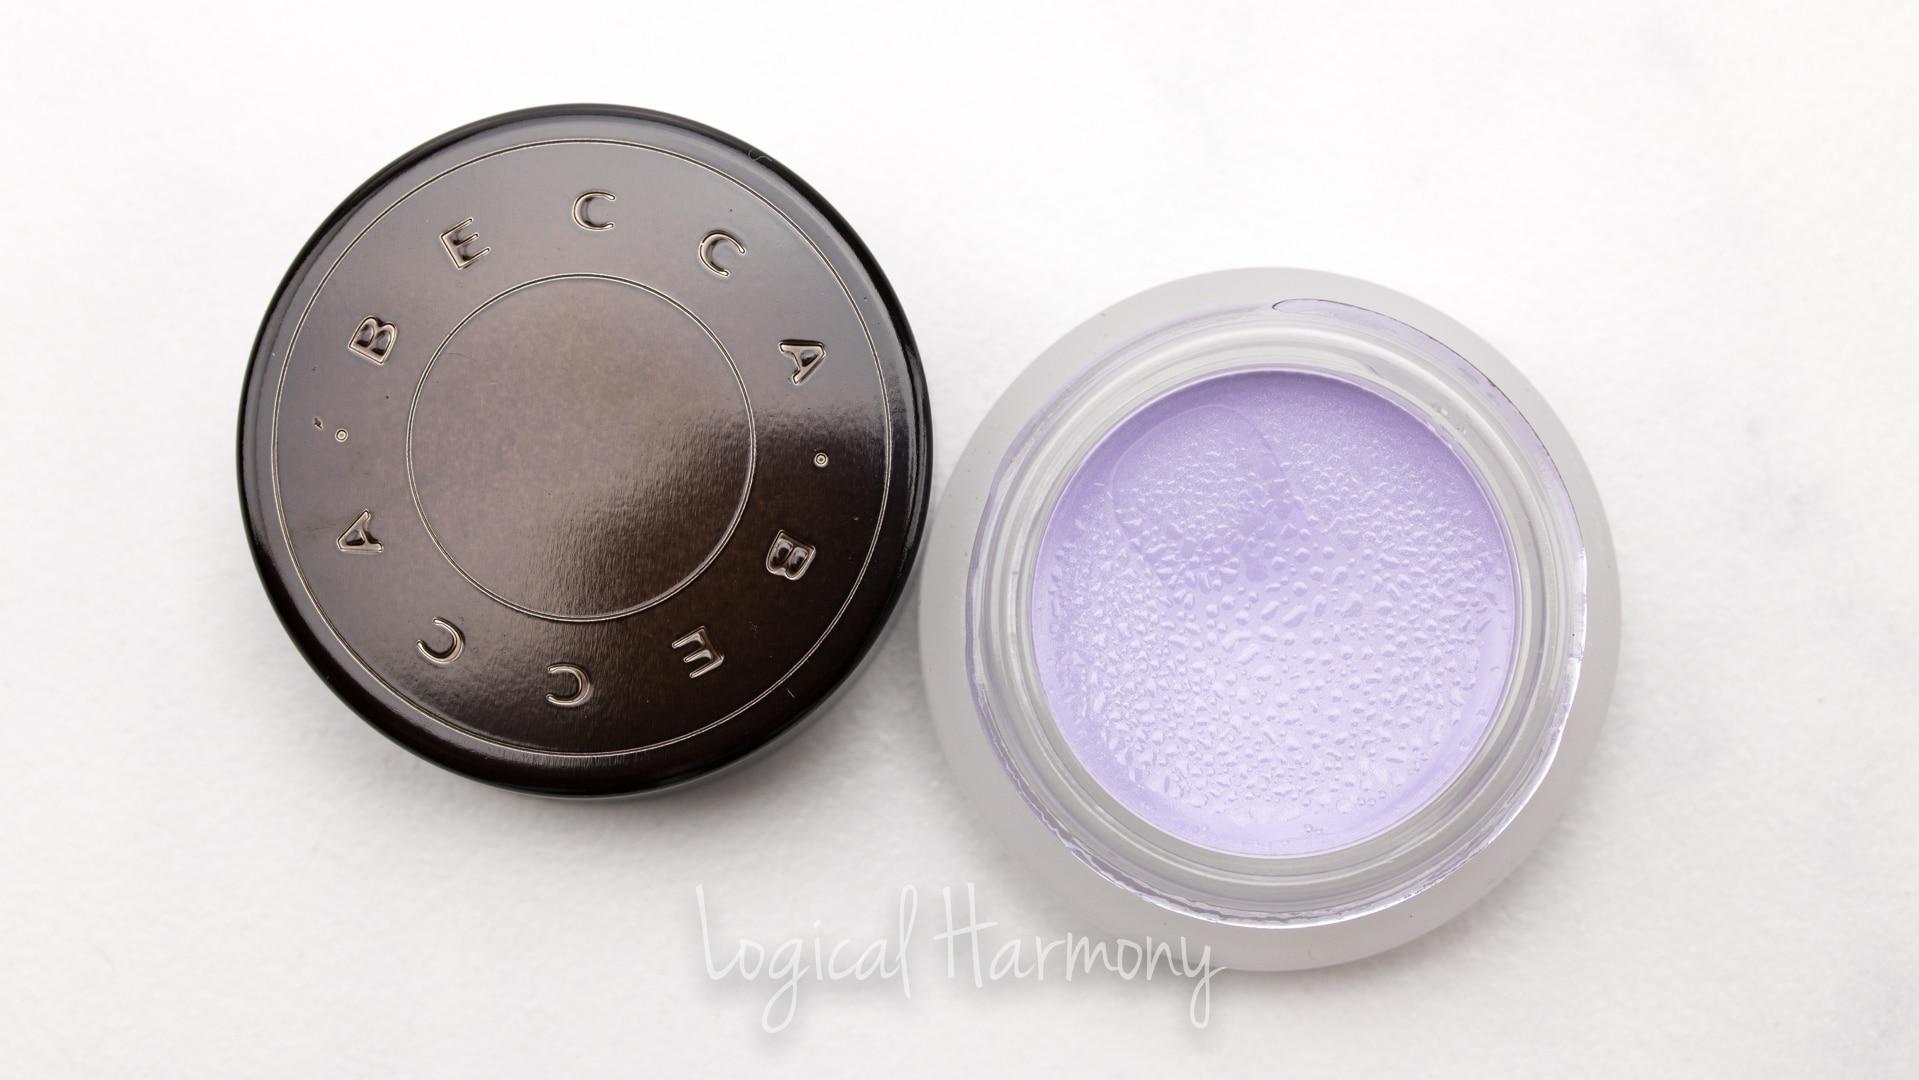 BECCA Backlight Targeted Colour Corrector in Violet